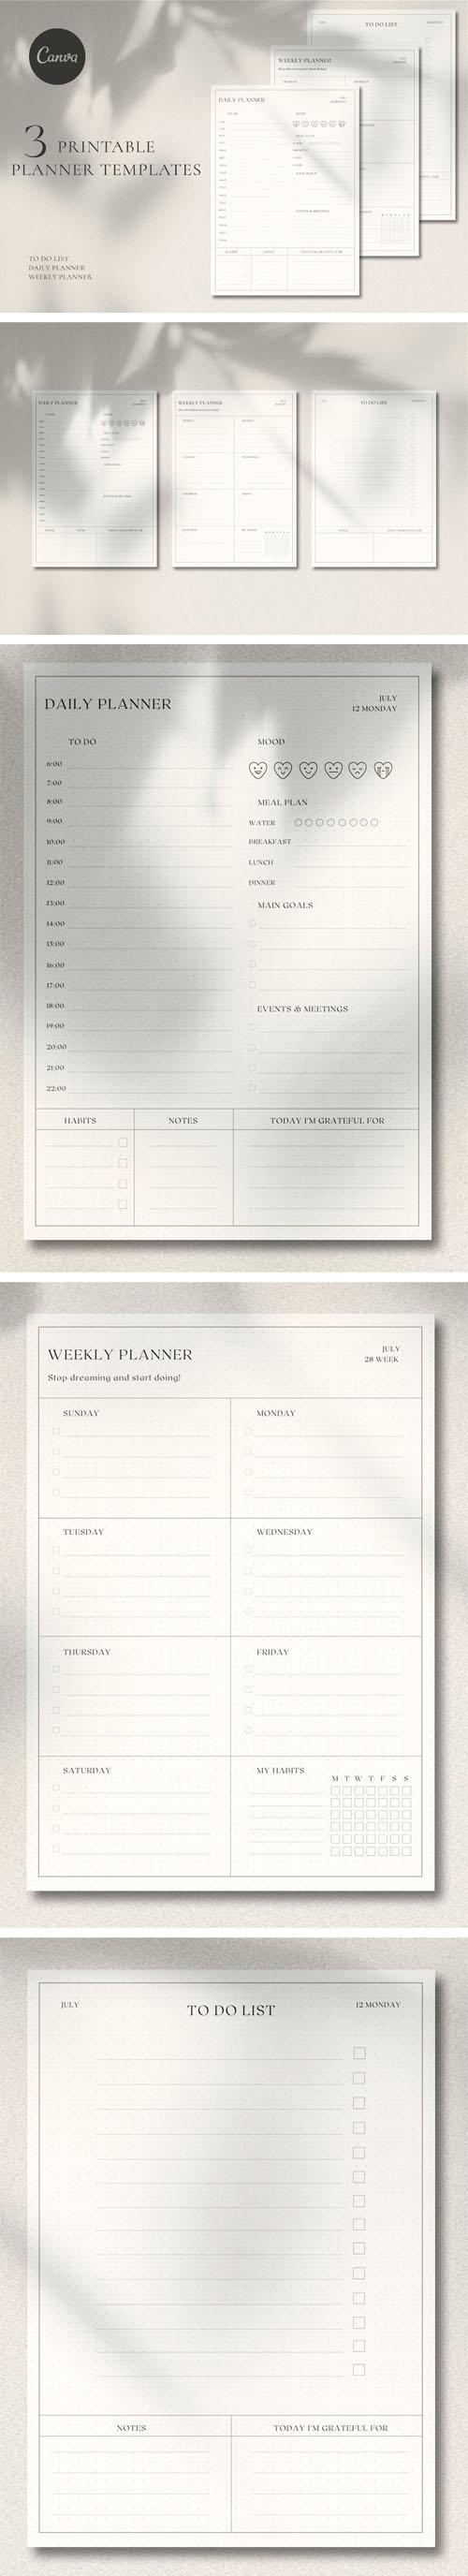 3 Printable Planner Templates